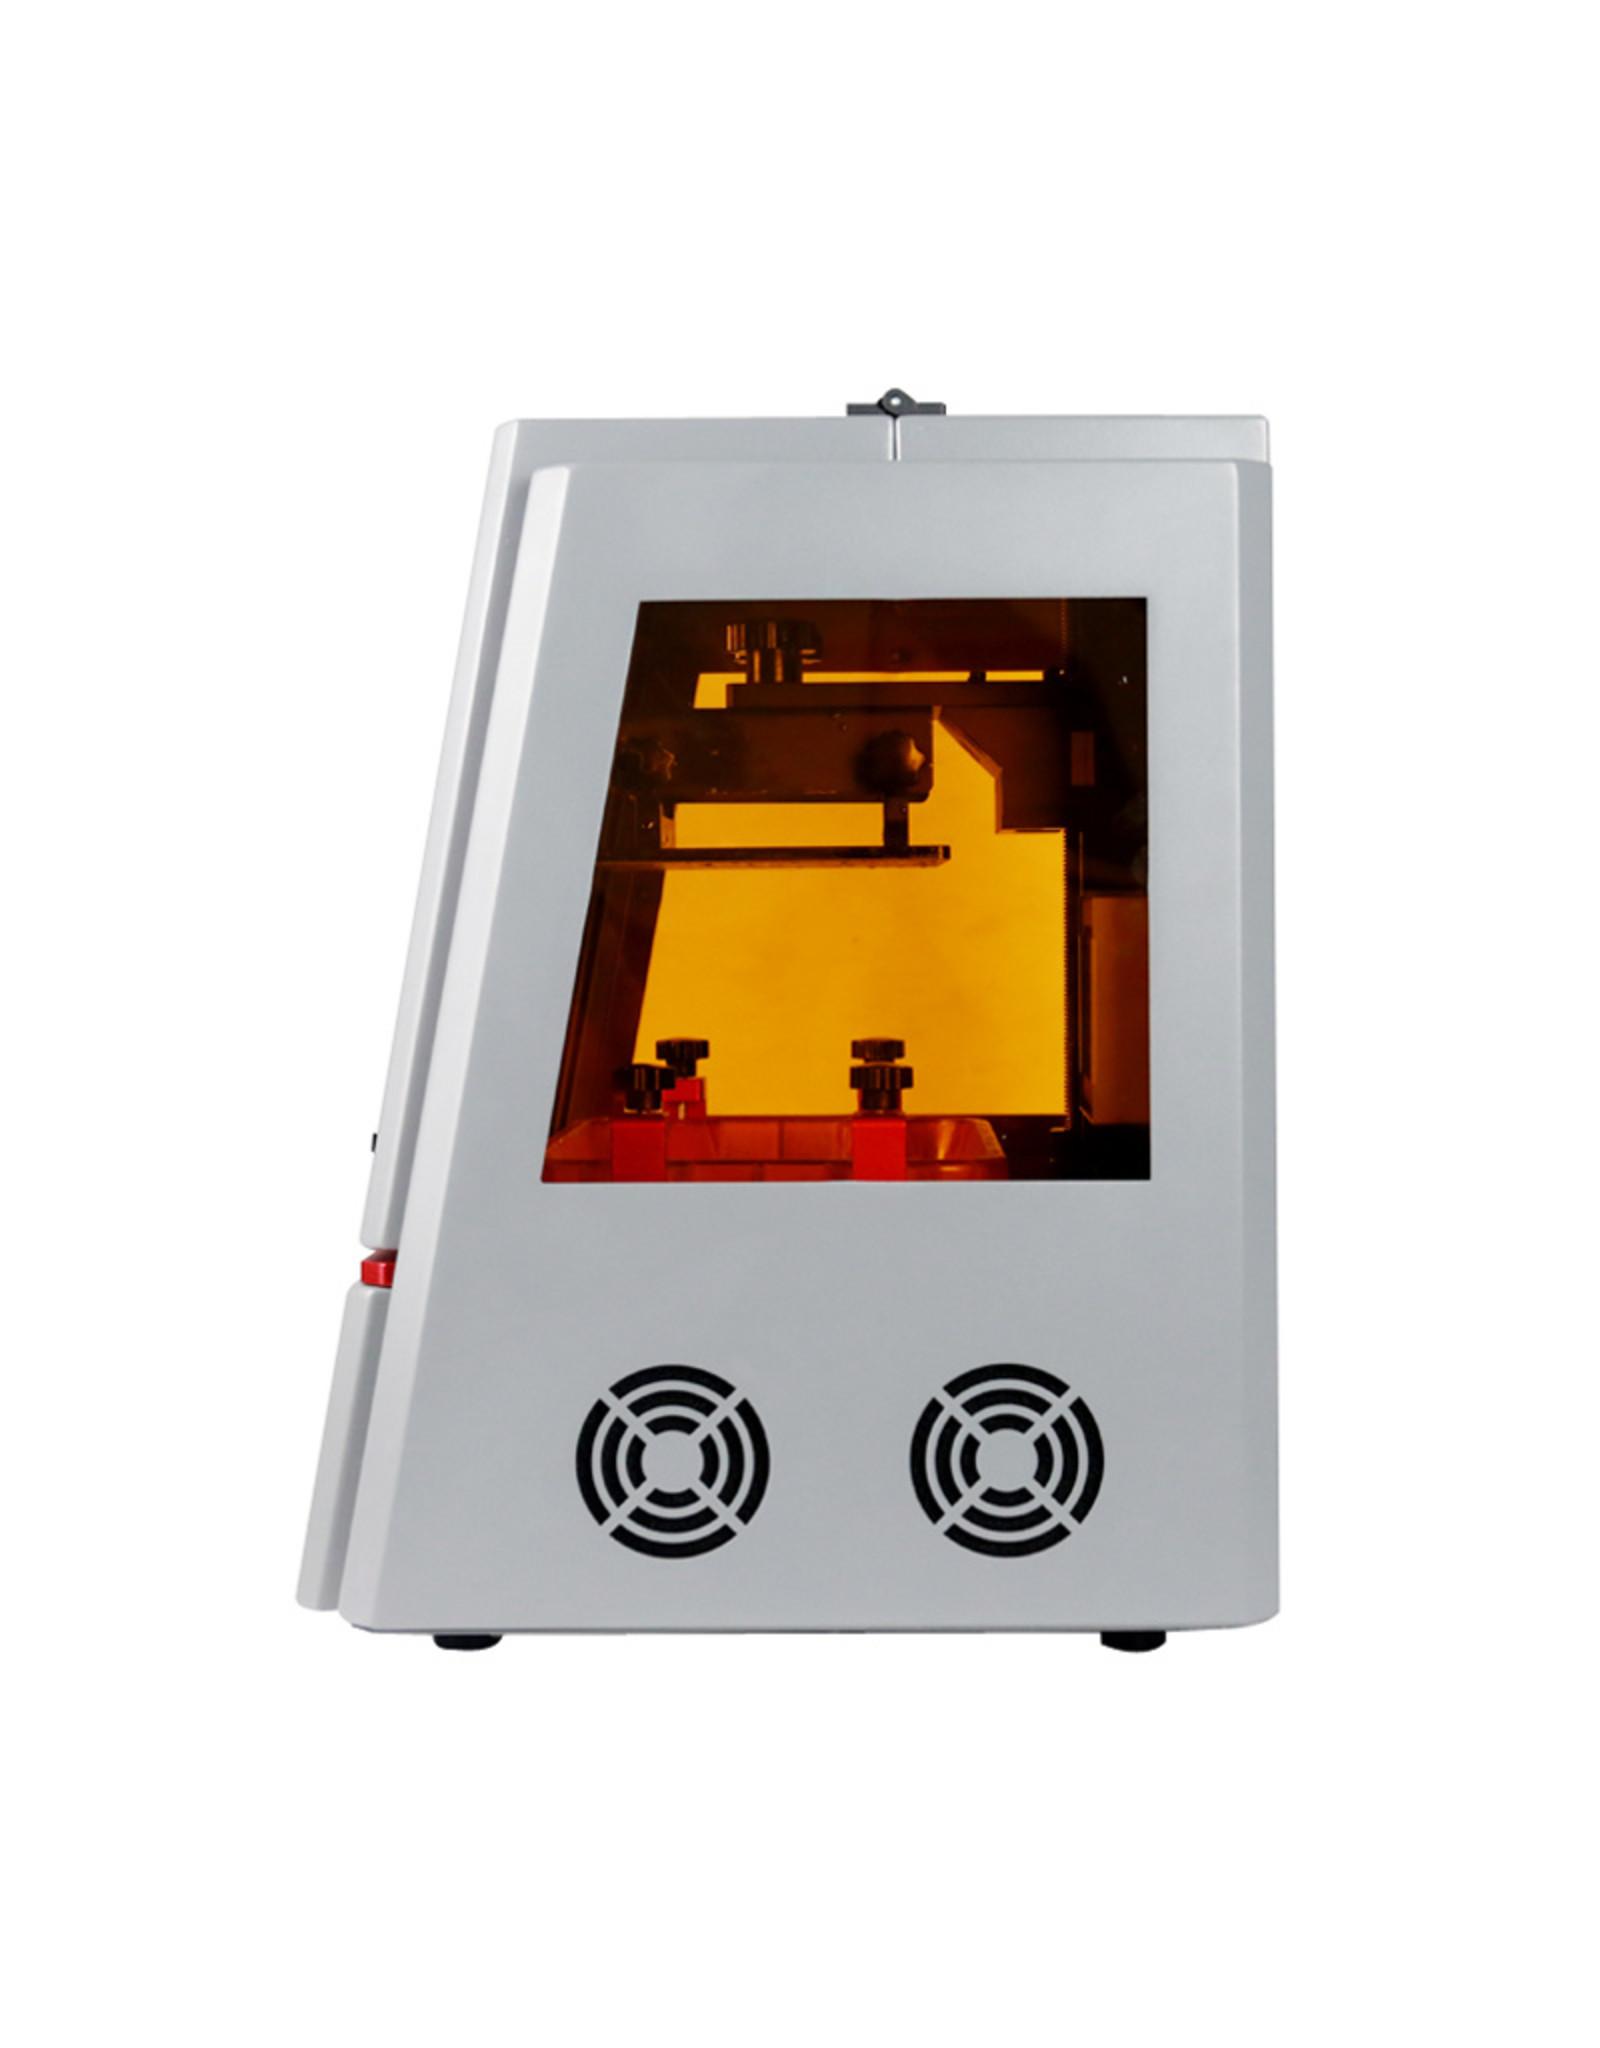 "Wanhao Wanhao Duplicator D11 - CGR 8.9"" Mono"